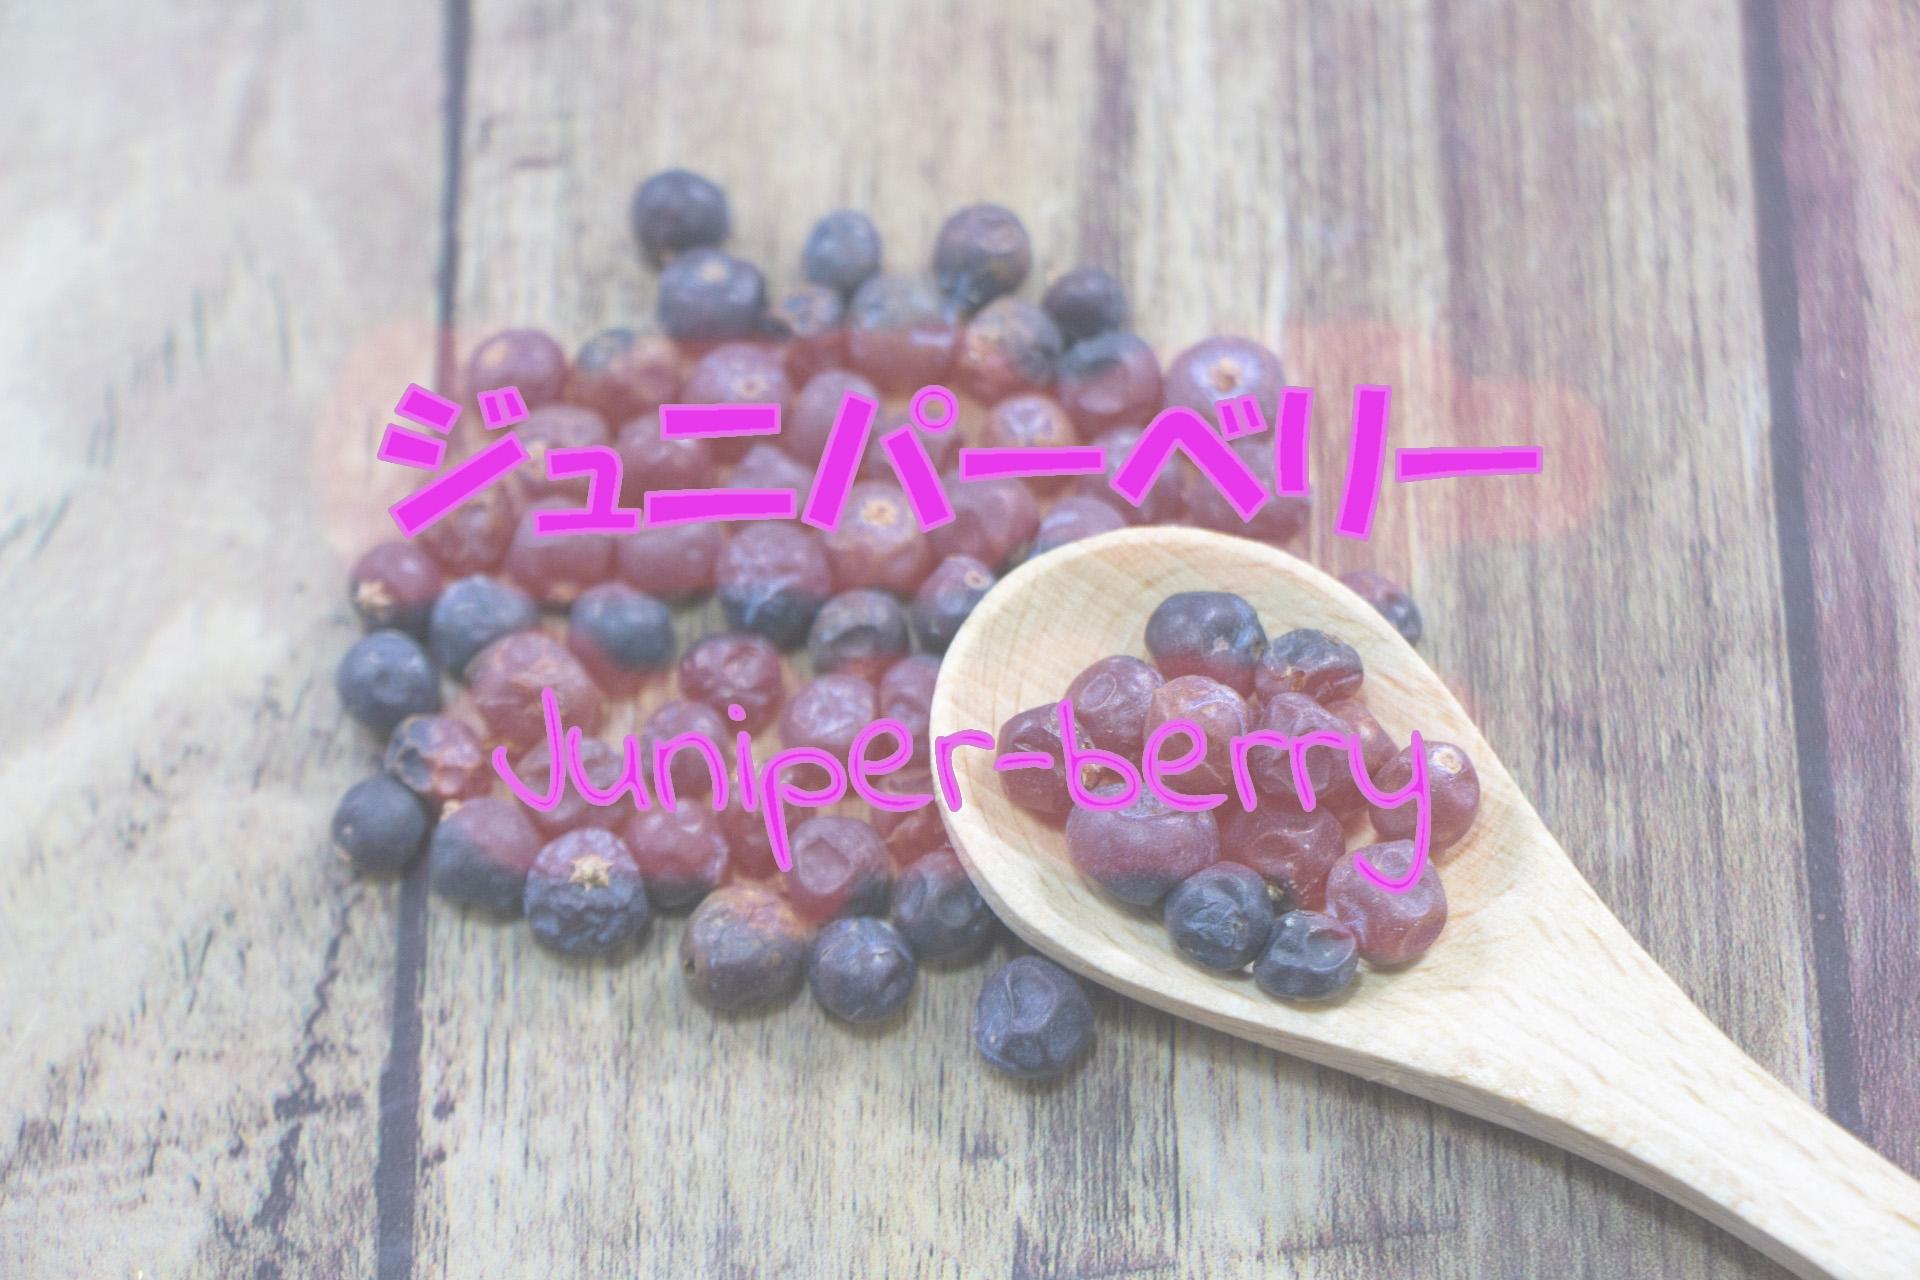 juniper-berry_191117